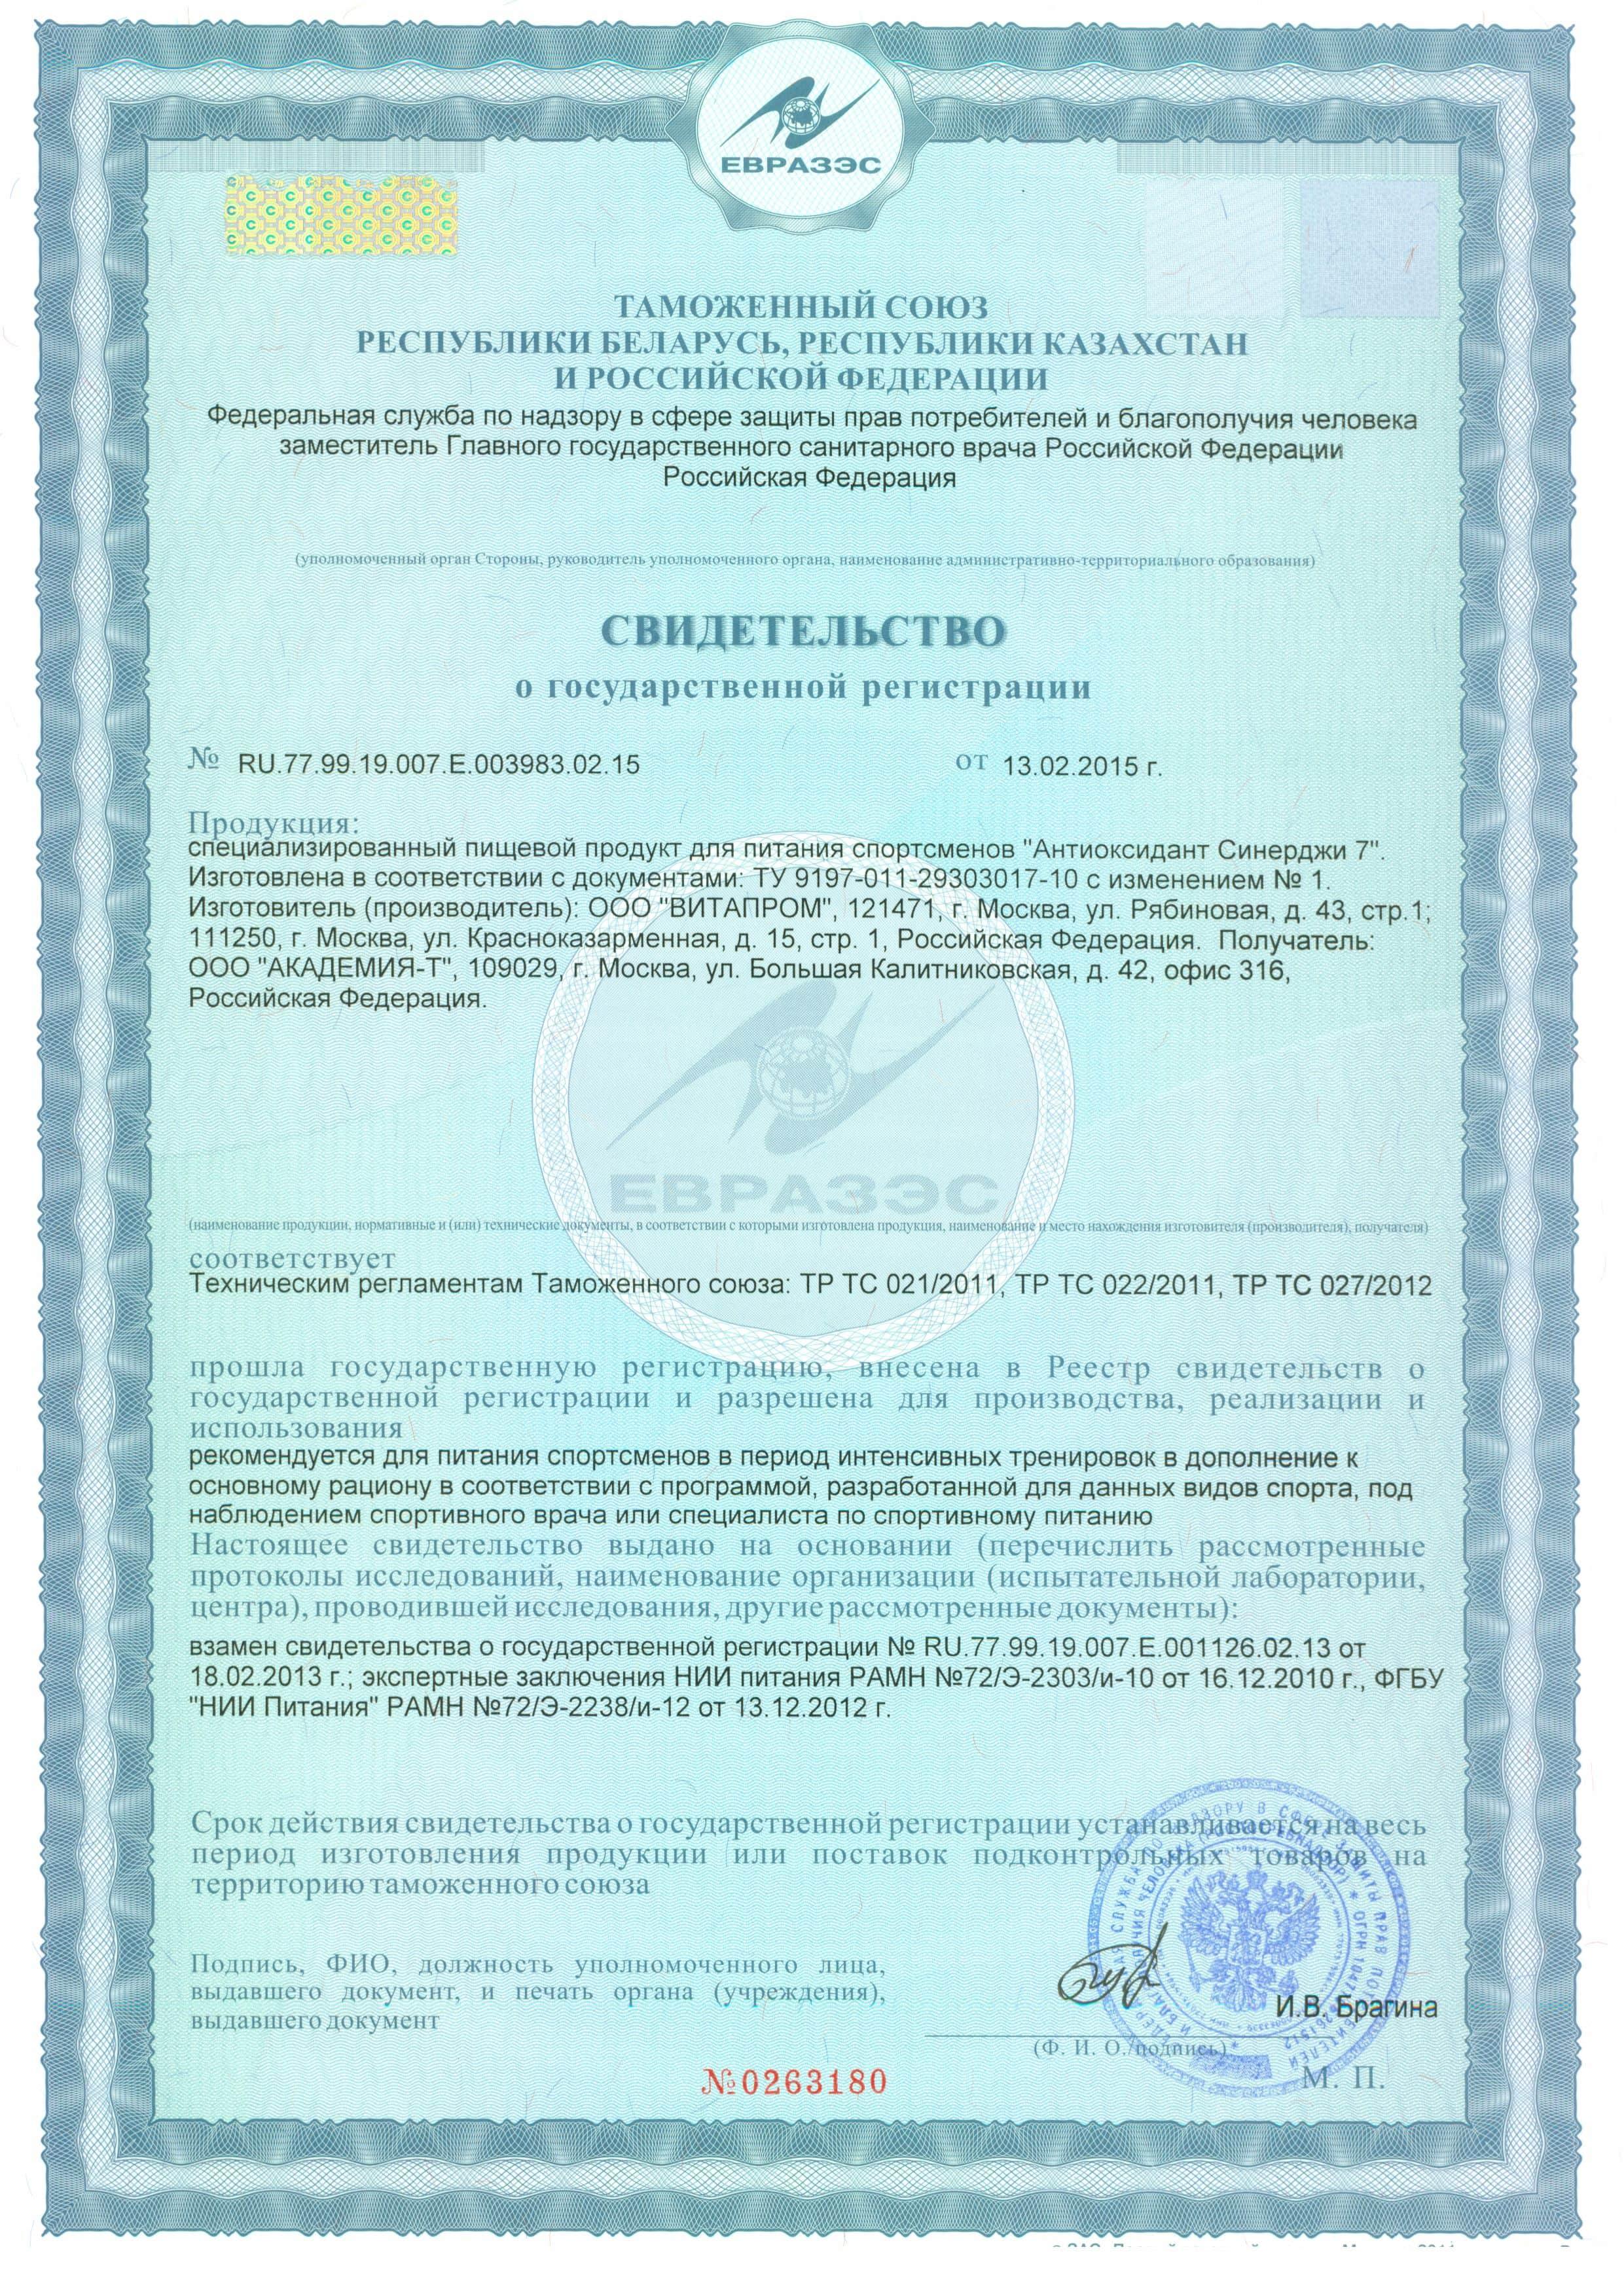 Сертификат ANTIOXIDANT Synergy 7